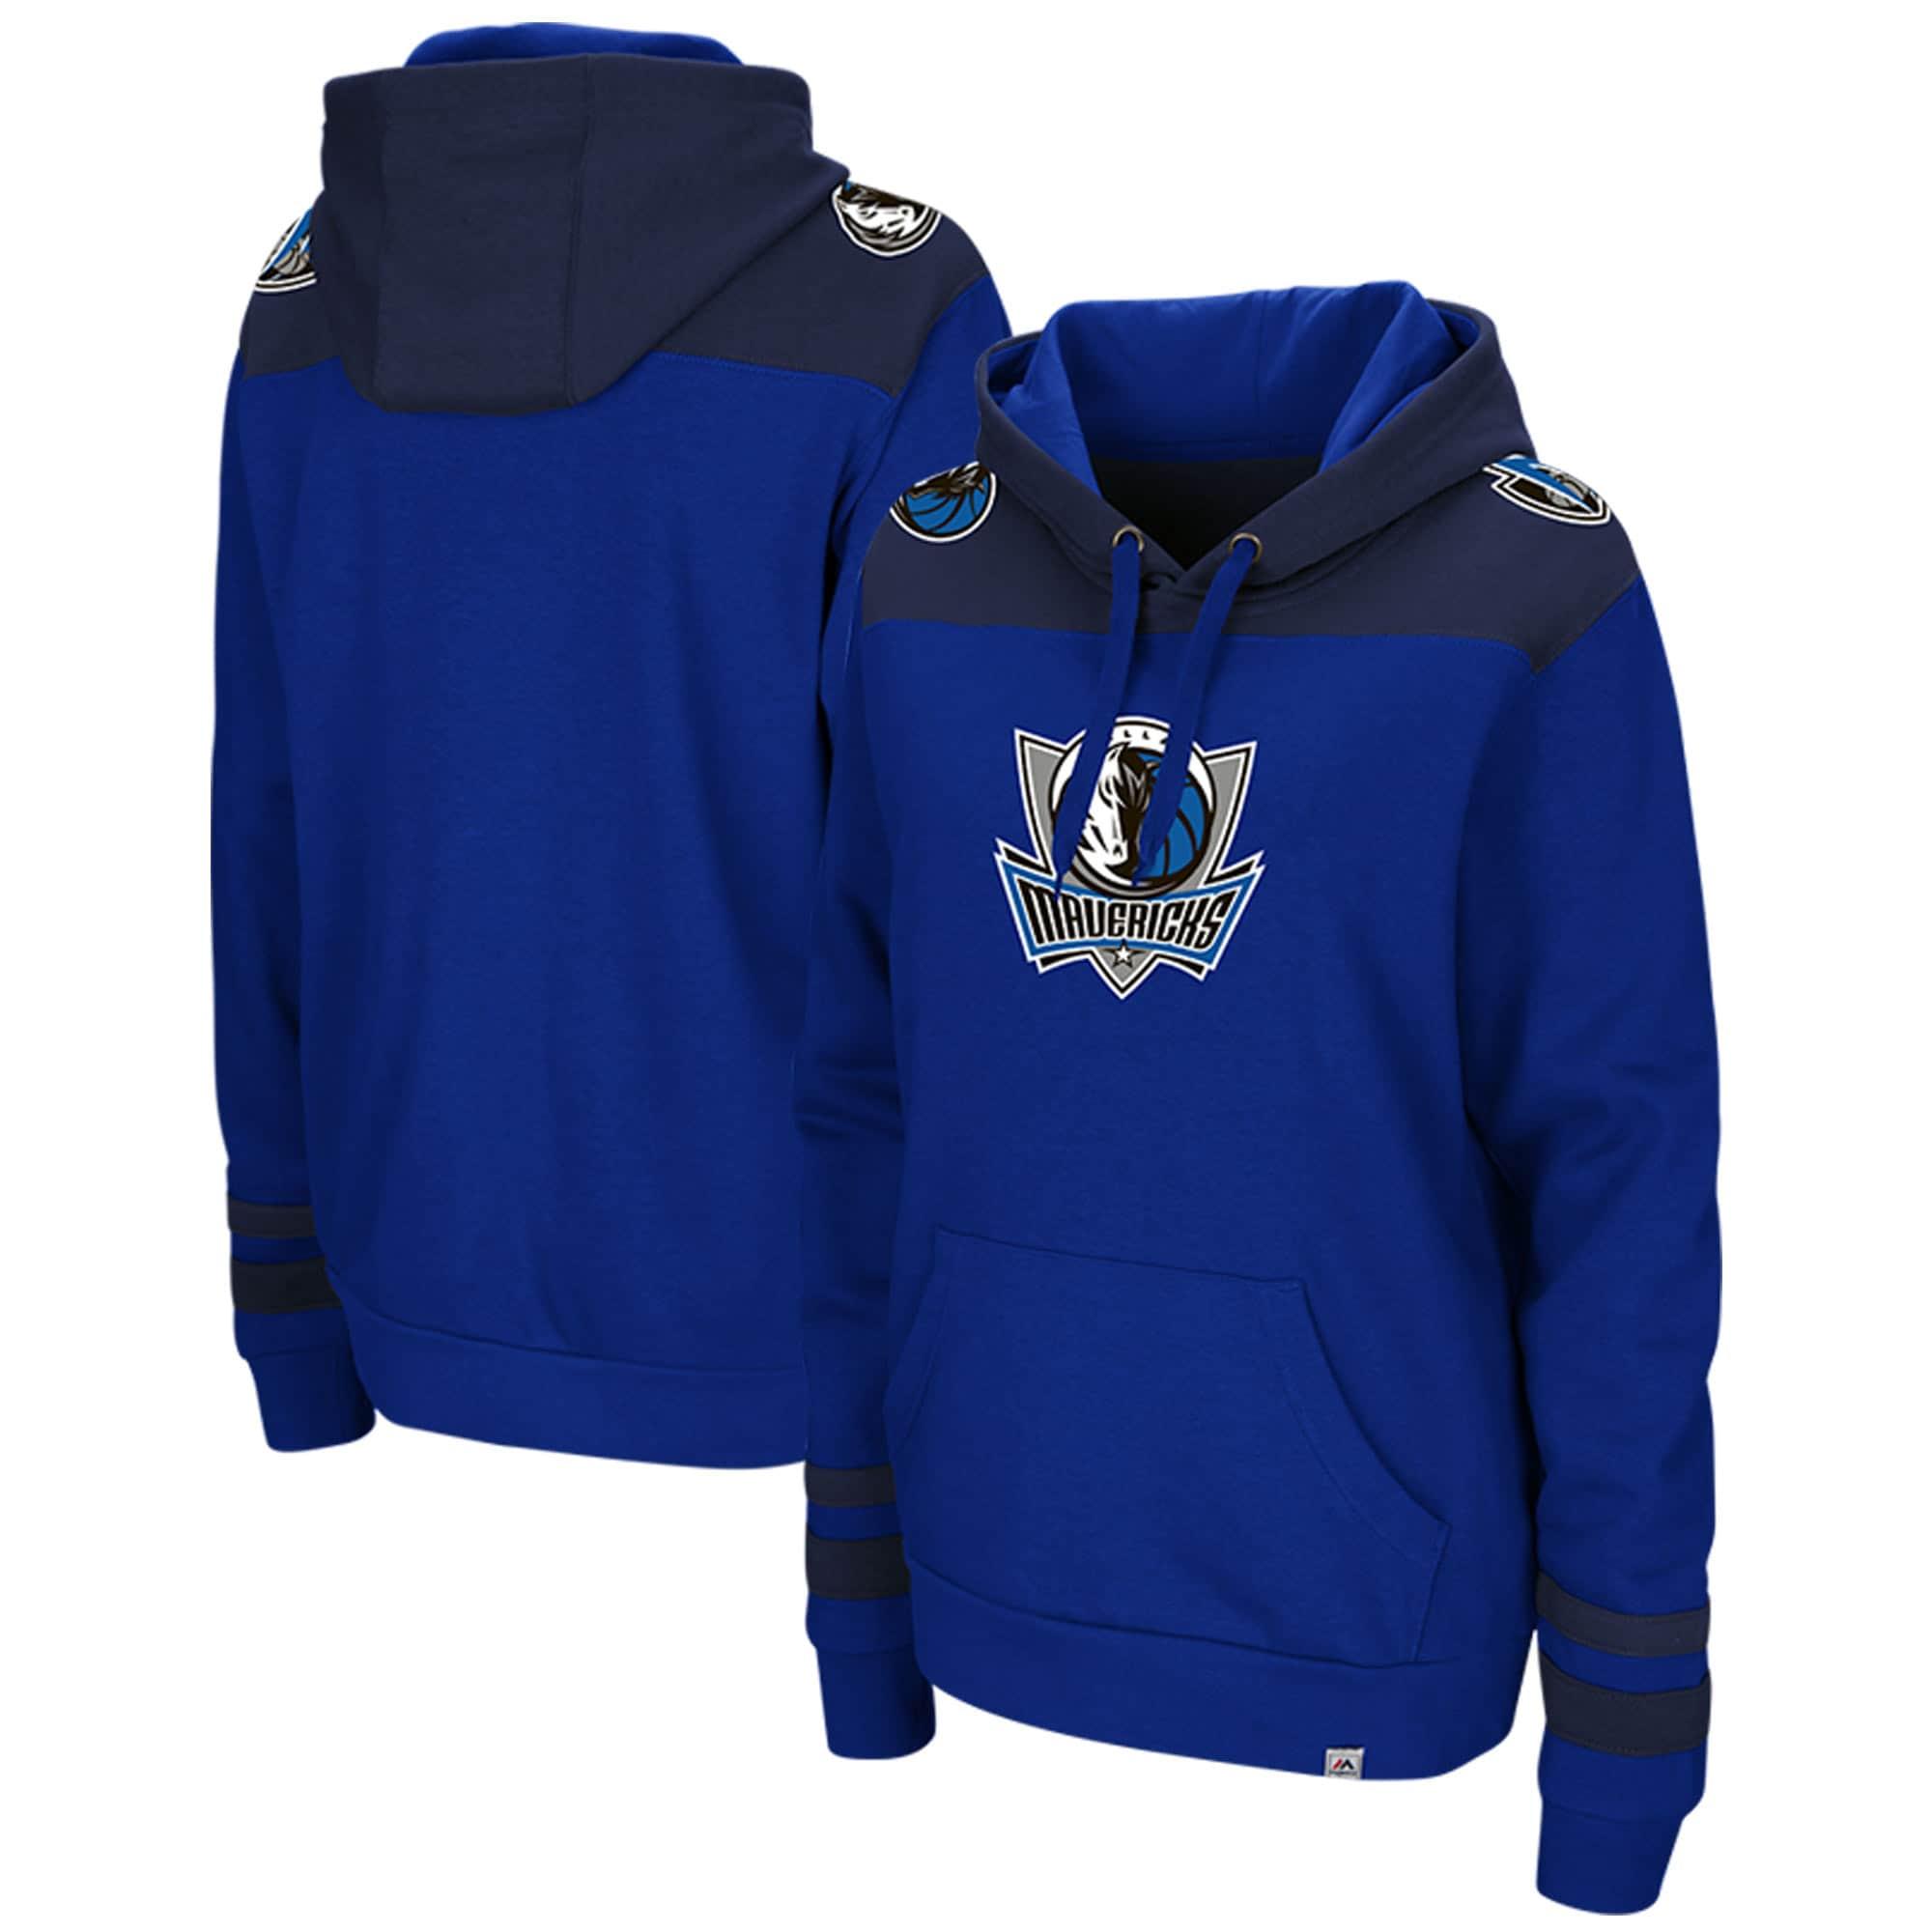 Dallas Mavericks Majestic Triple Double Pullover Hoodie - Blue/Navy